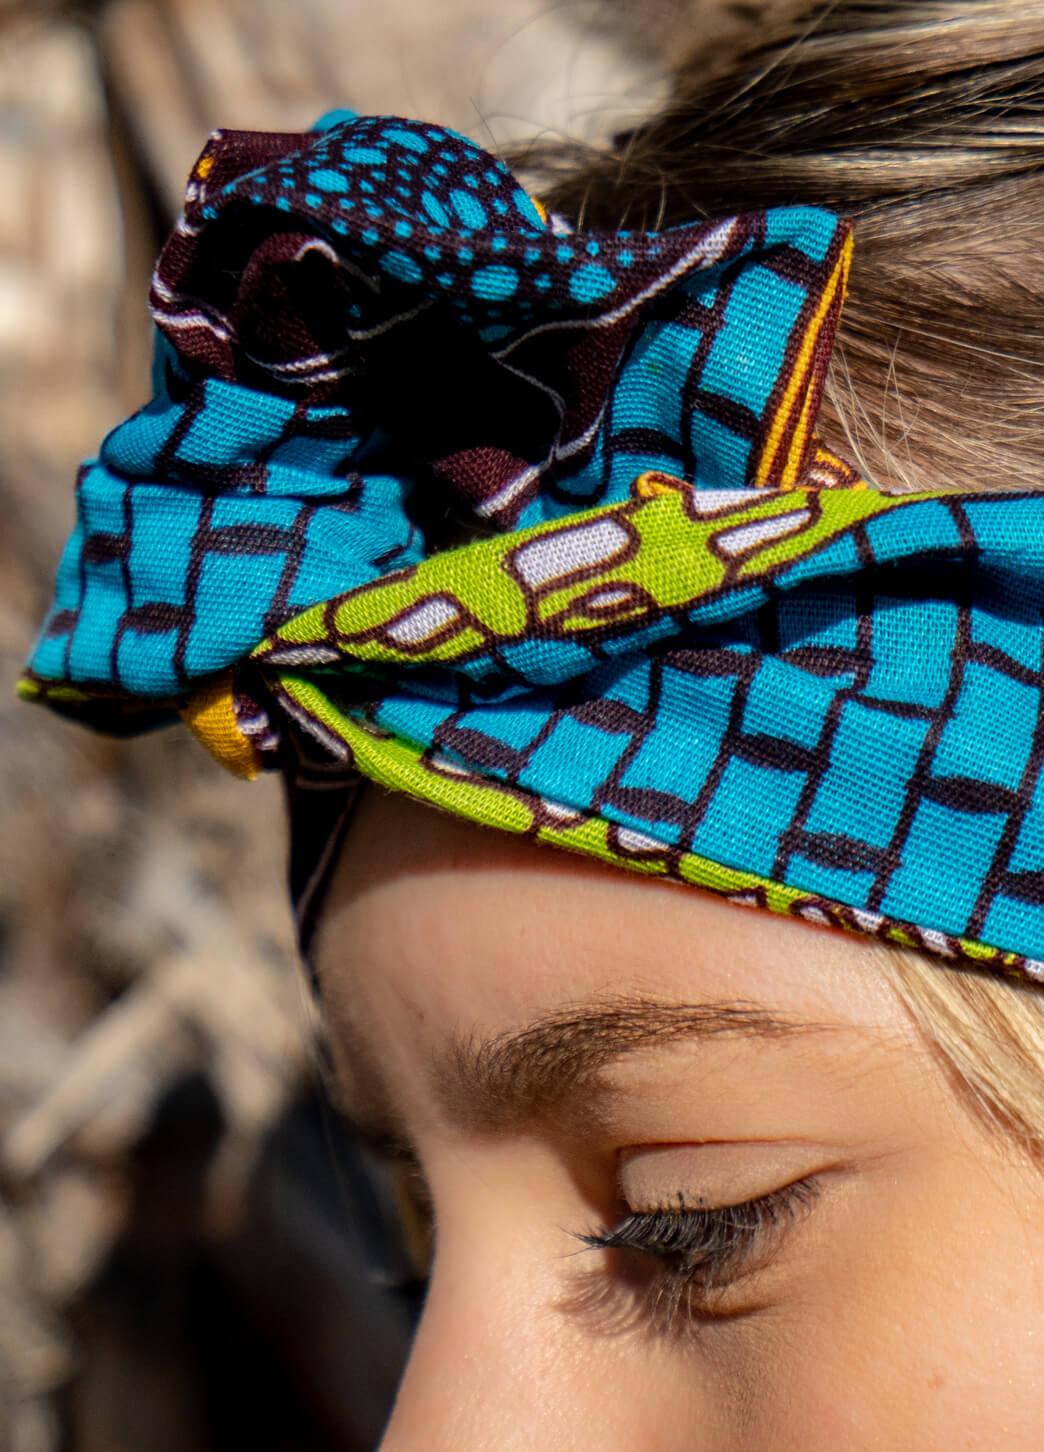 headband-moea-afrique-ethnique-wax-solidaire